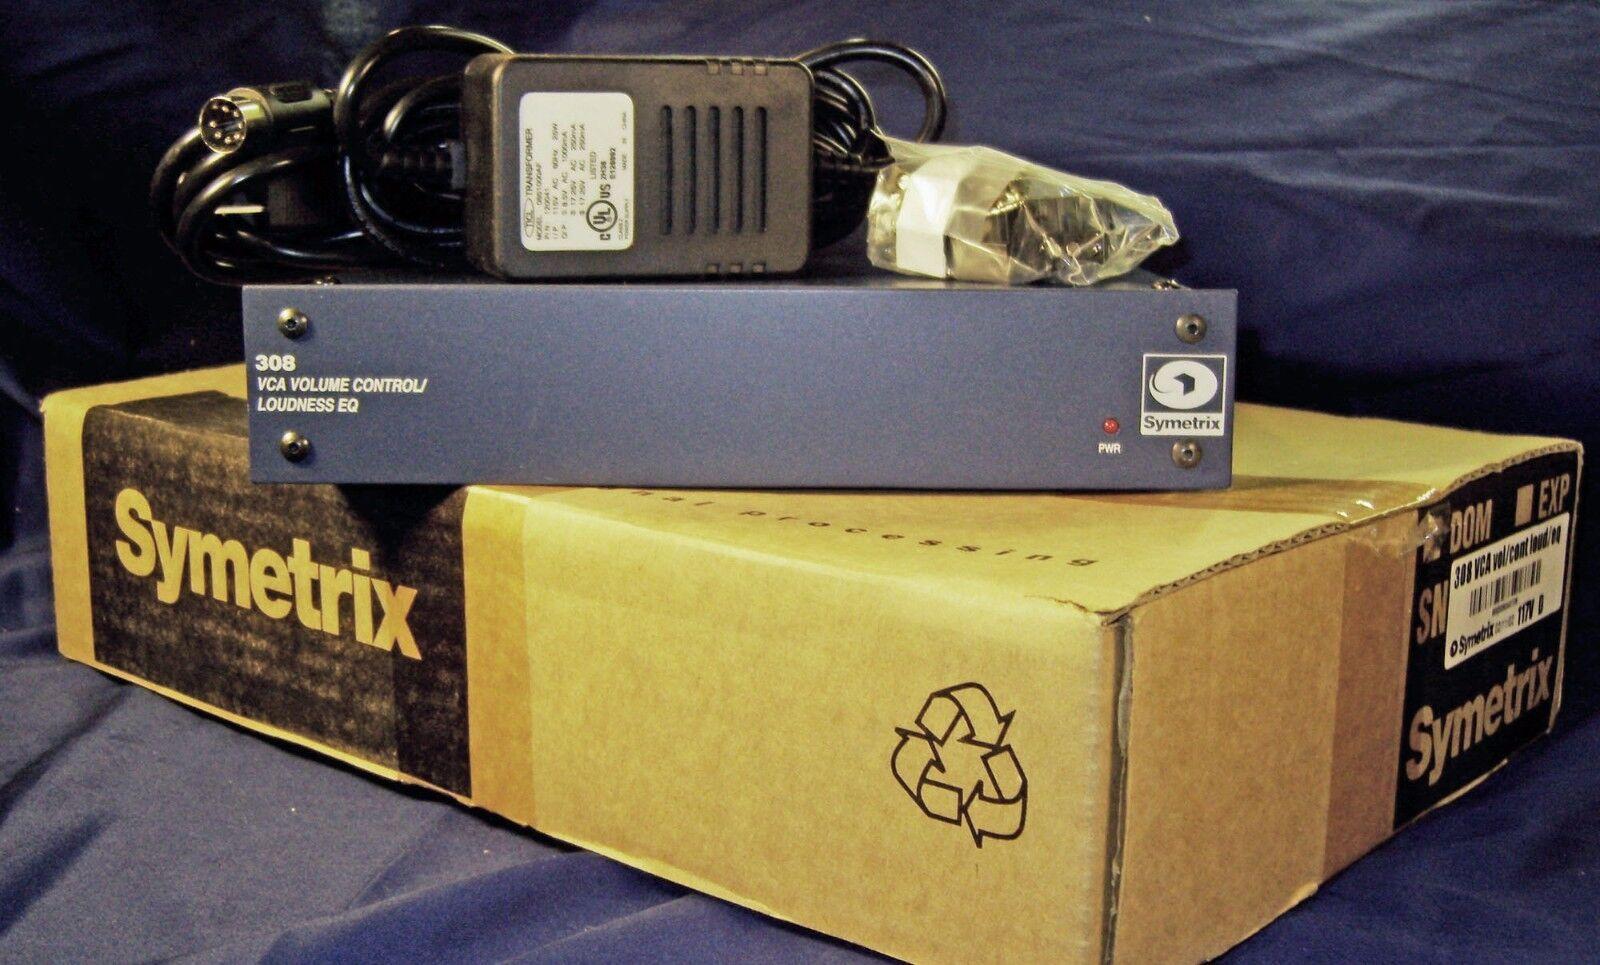 308 VCA Volume Control Loudness EQ